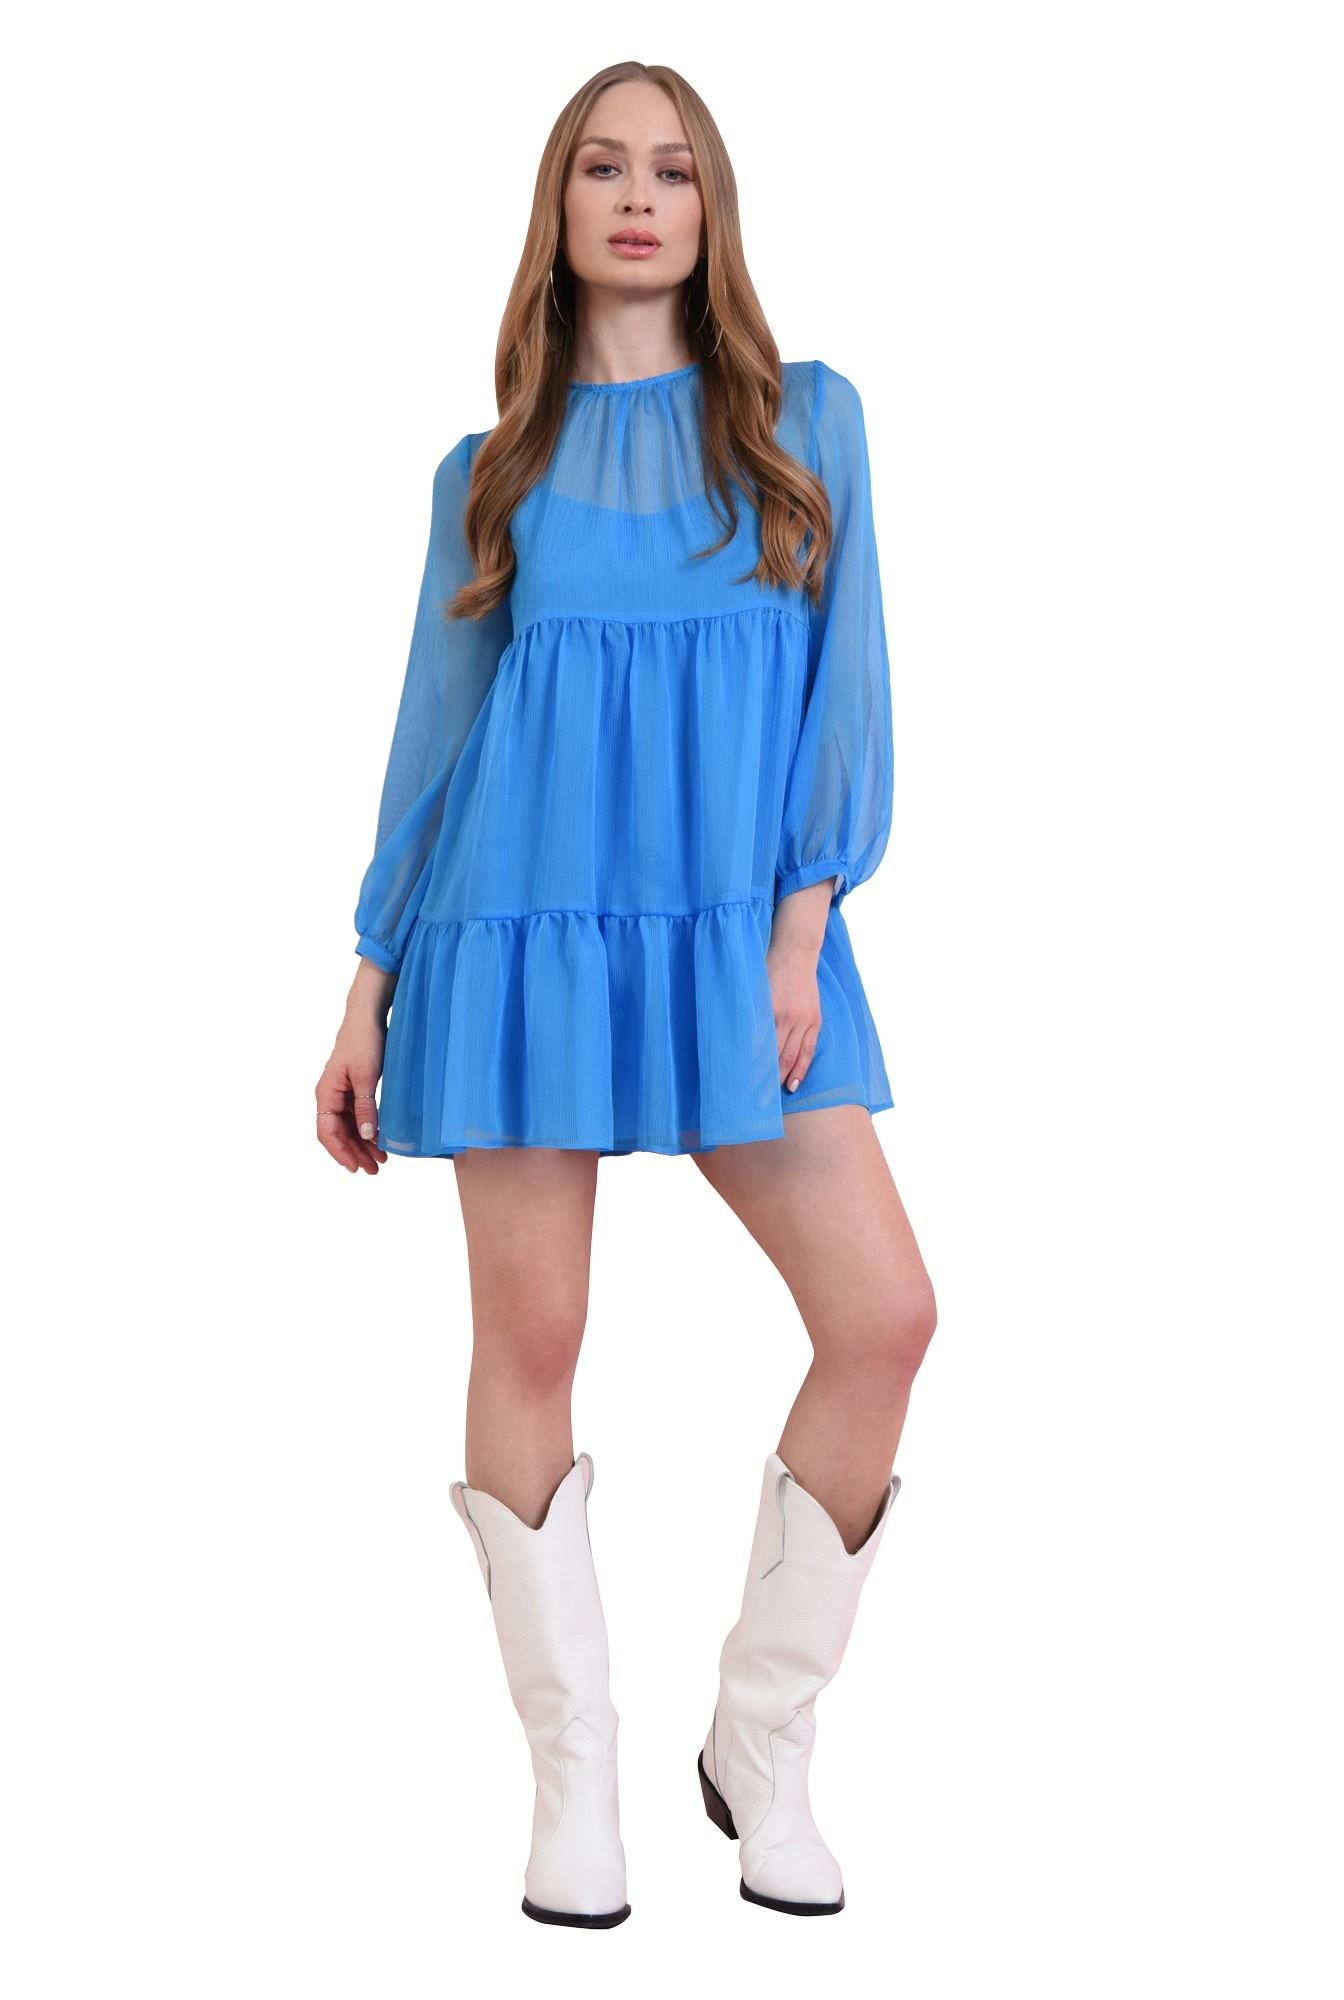 3 - rochie scurta, albastra, babydoll